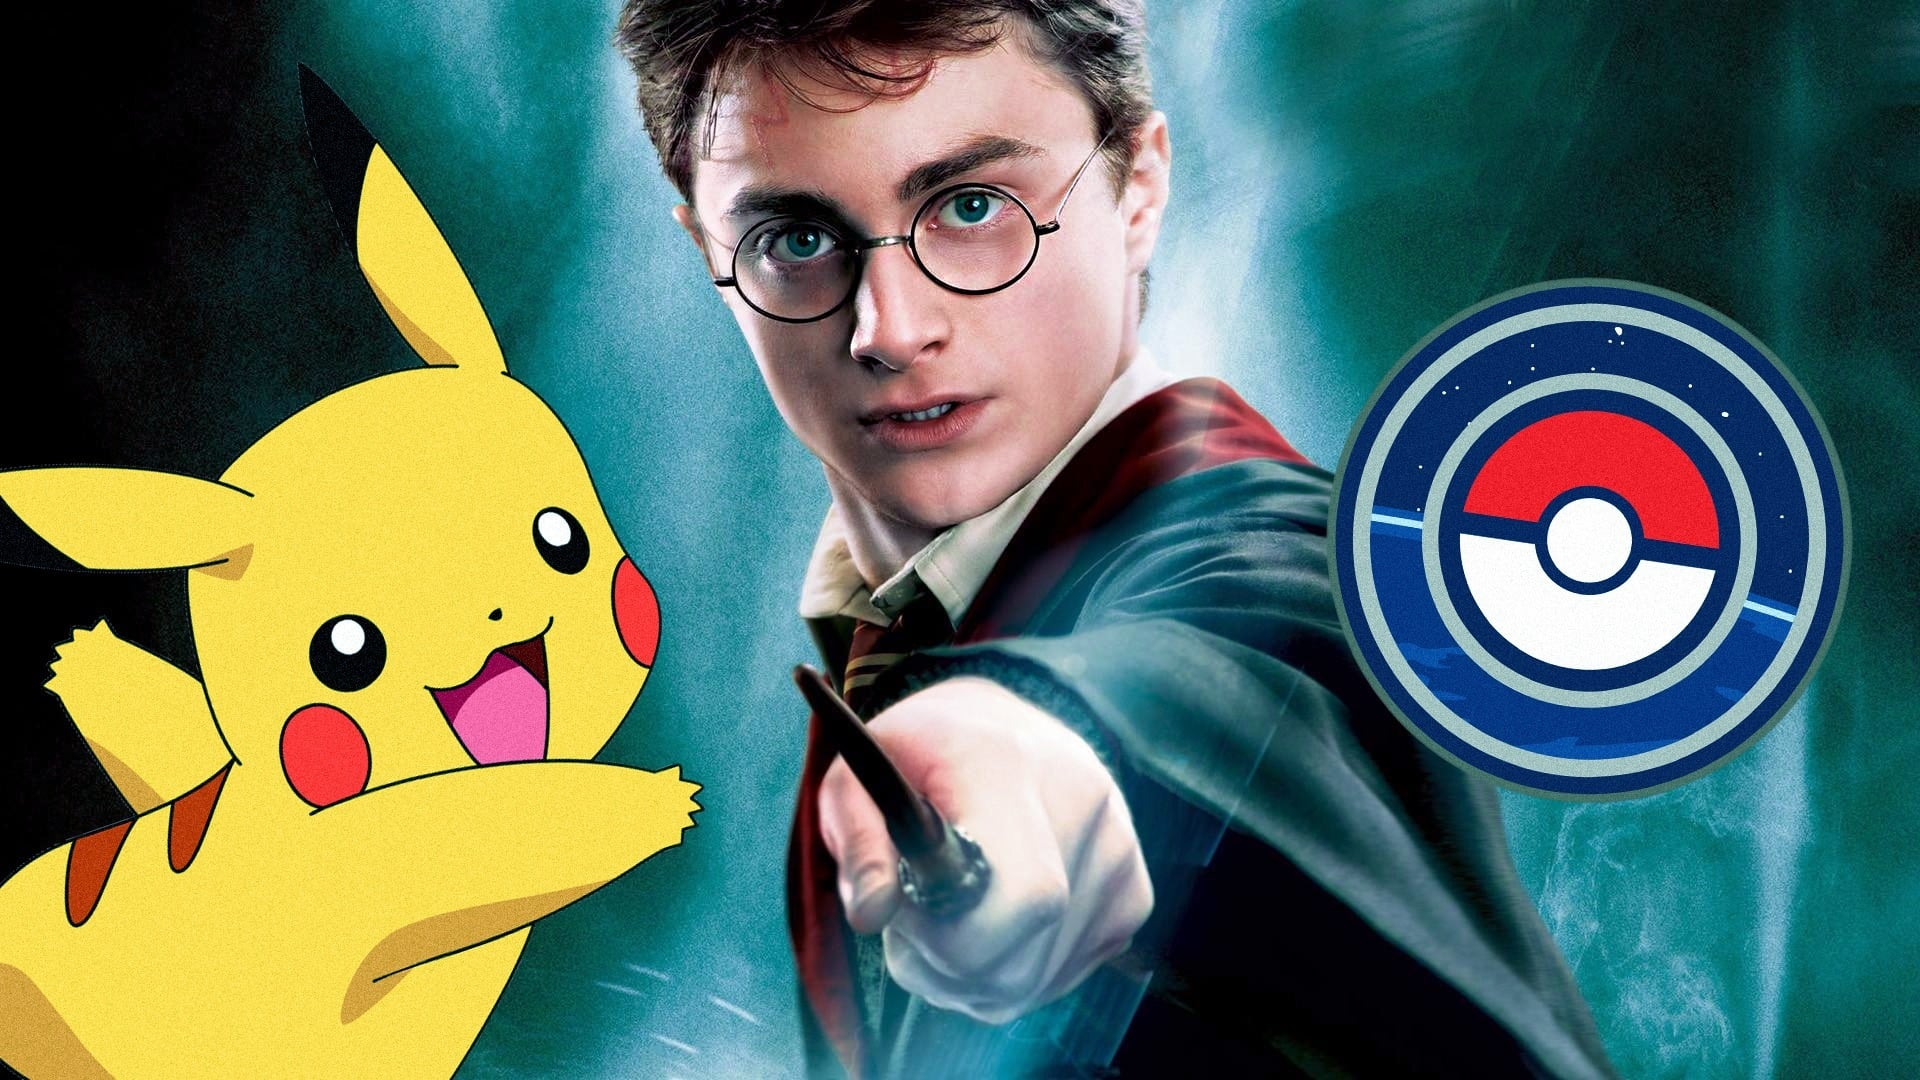 Harry Potter: Wiazrds Unite